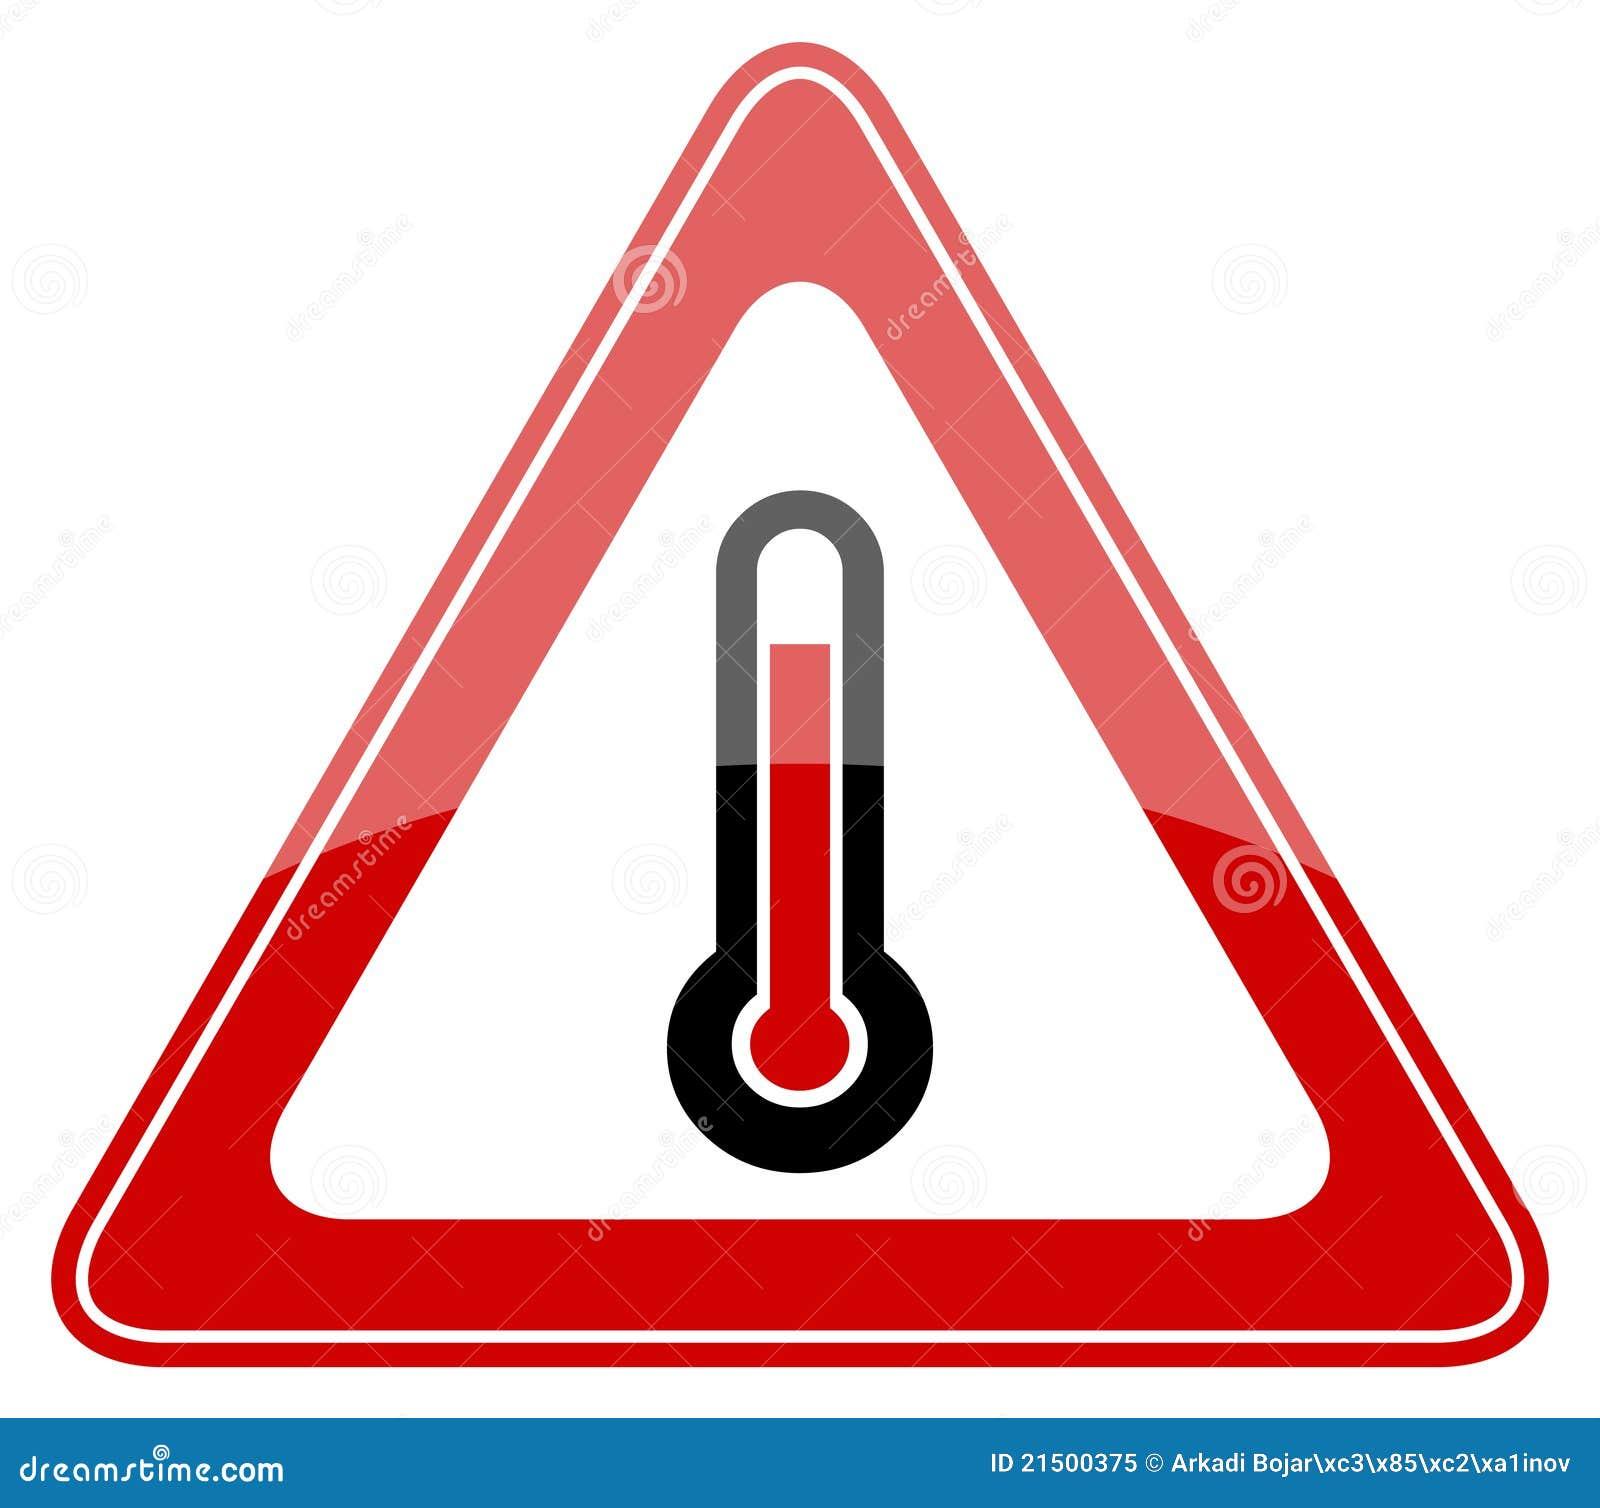 High Temperature Warning Sign Cartoon Vector | CartoonDealer.com ...